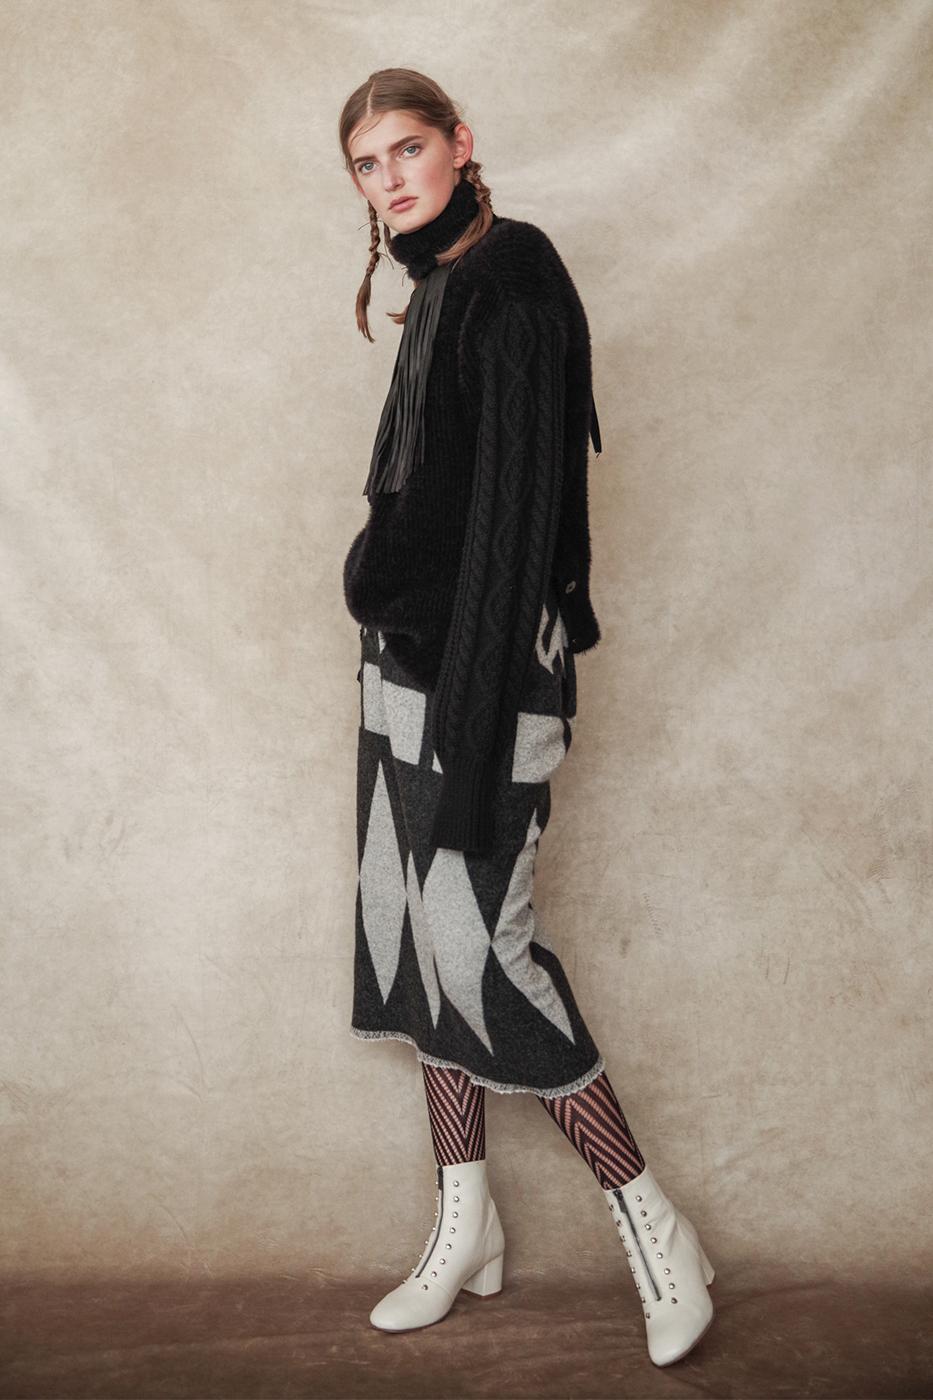 192048 Knit ¥28,000, 192016 Skirt ¥30,000